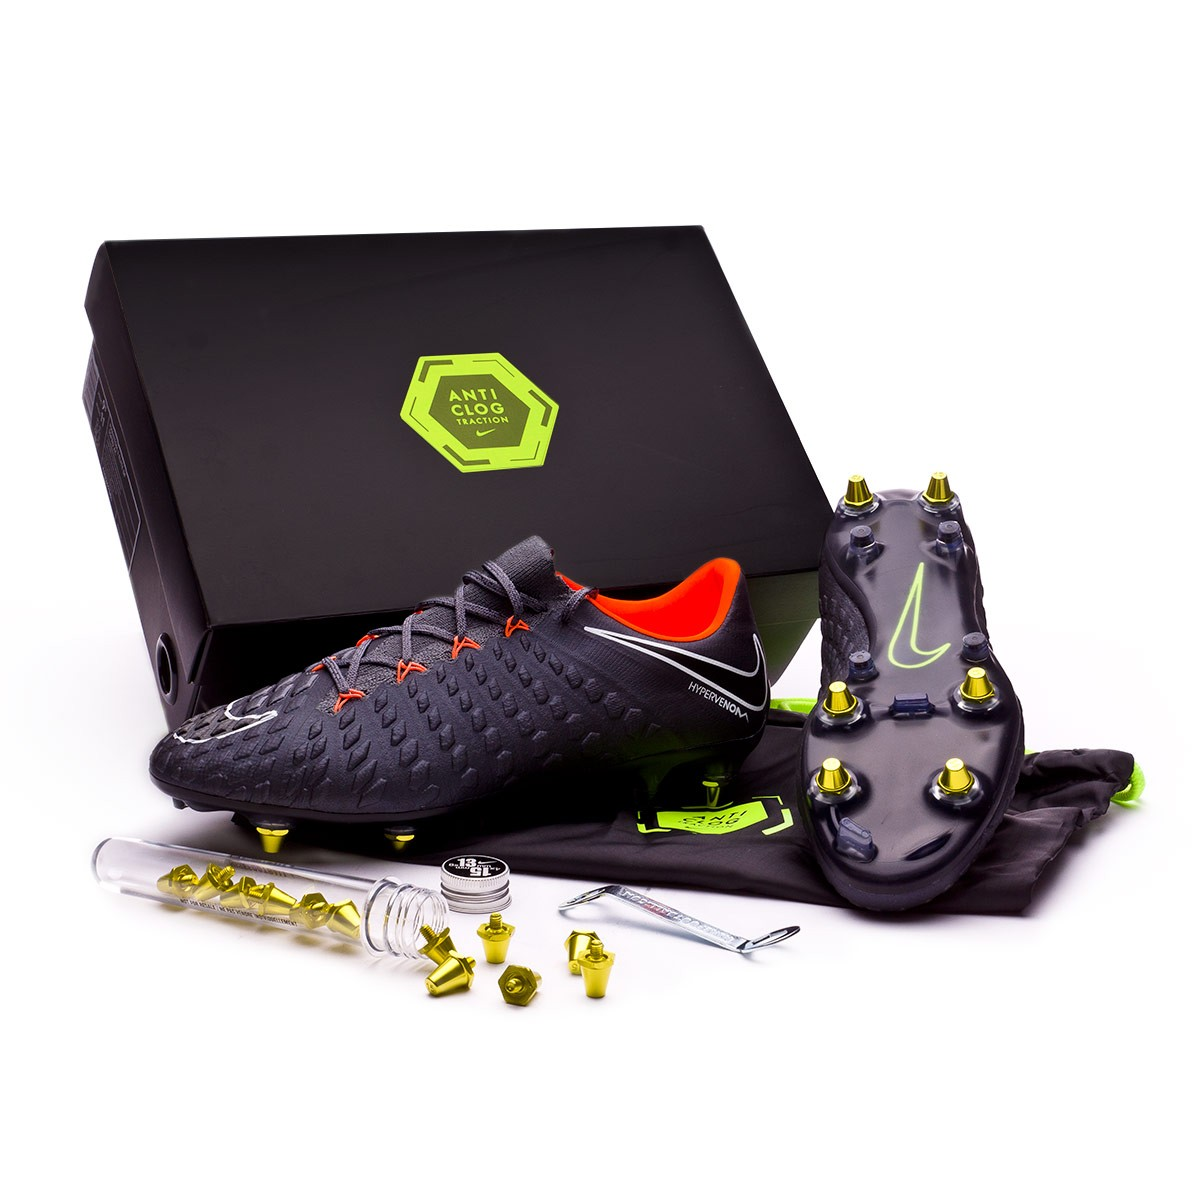 new style 21453 0daed Nike Hypervenom Phantom III Elite SG-Pro Anti-Clog Football Boots